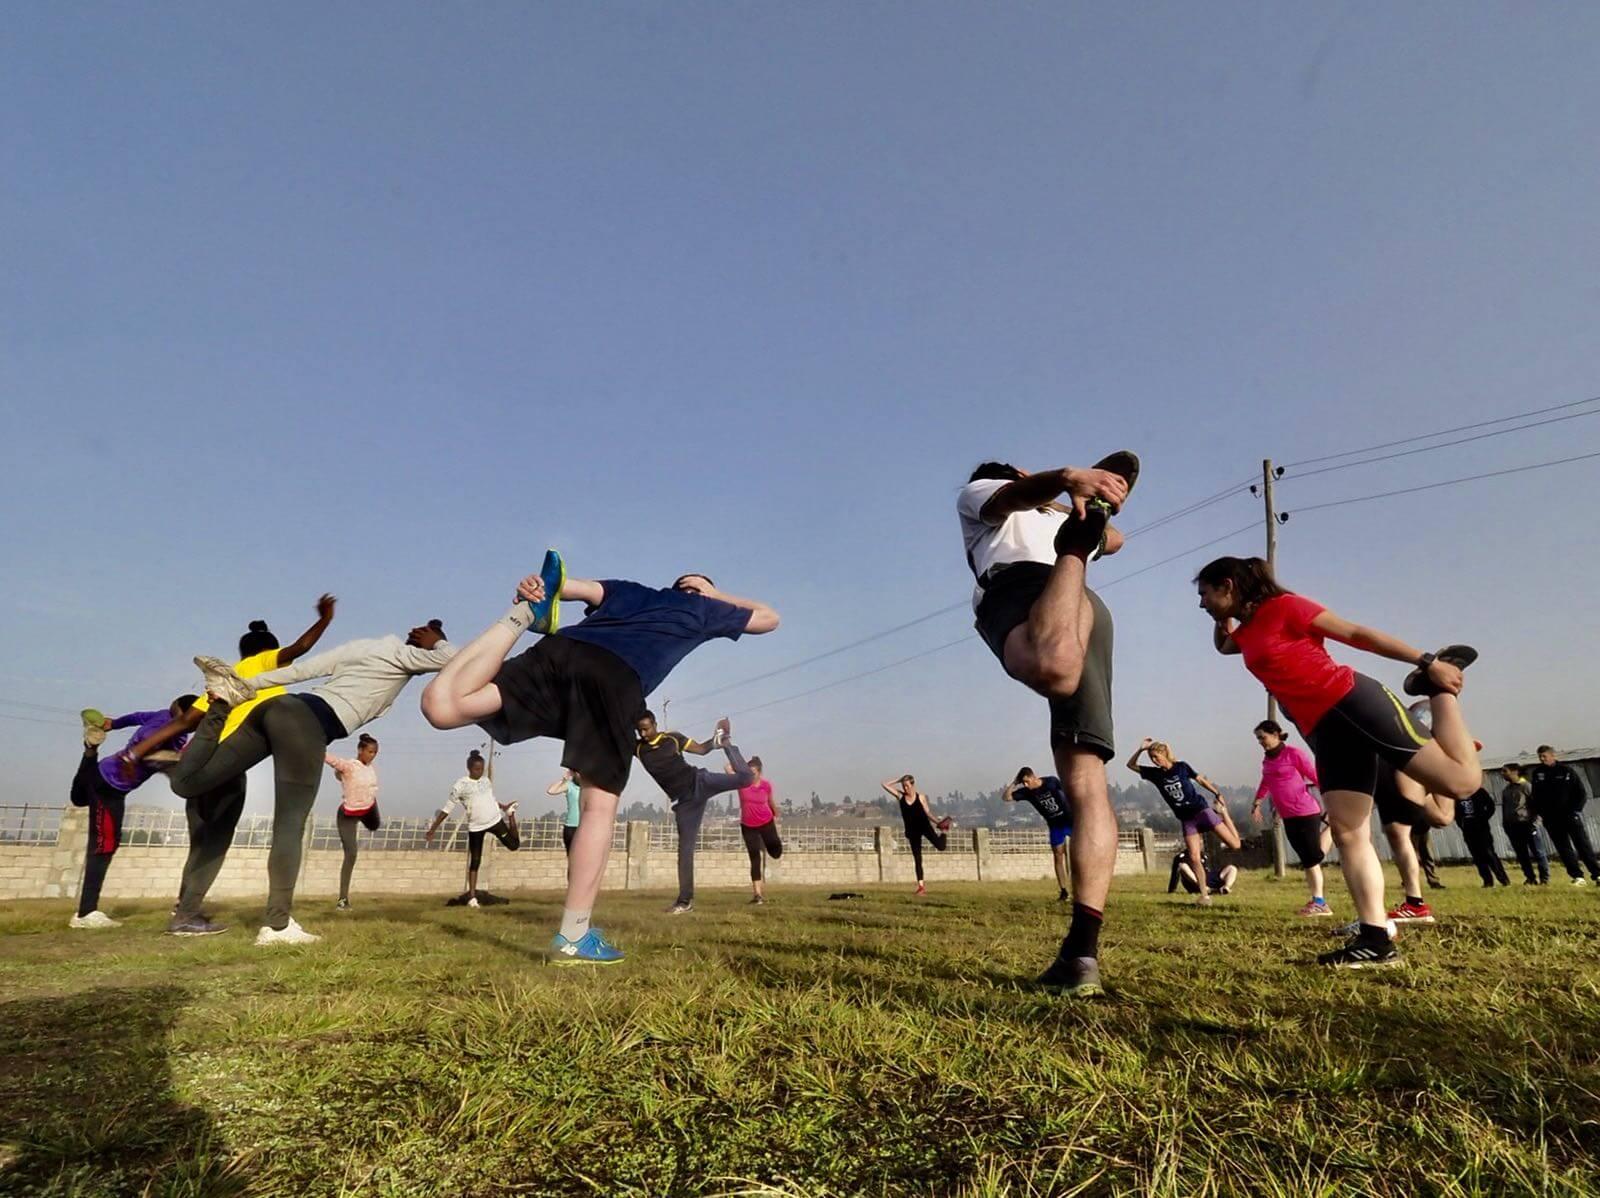 debrebirhan corredoras running